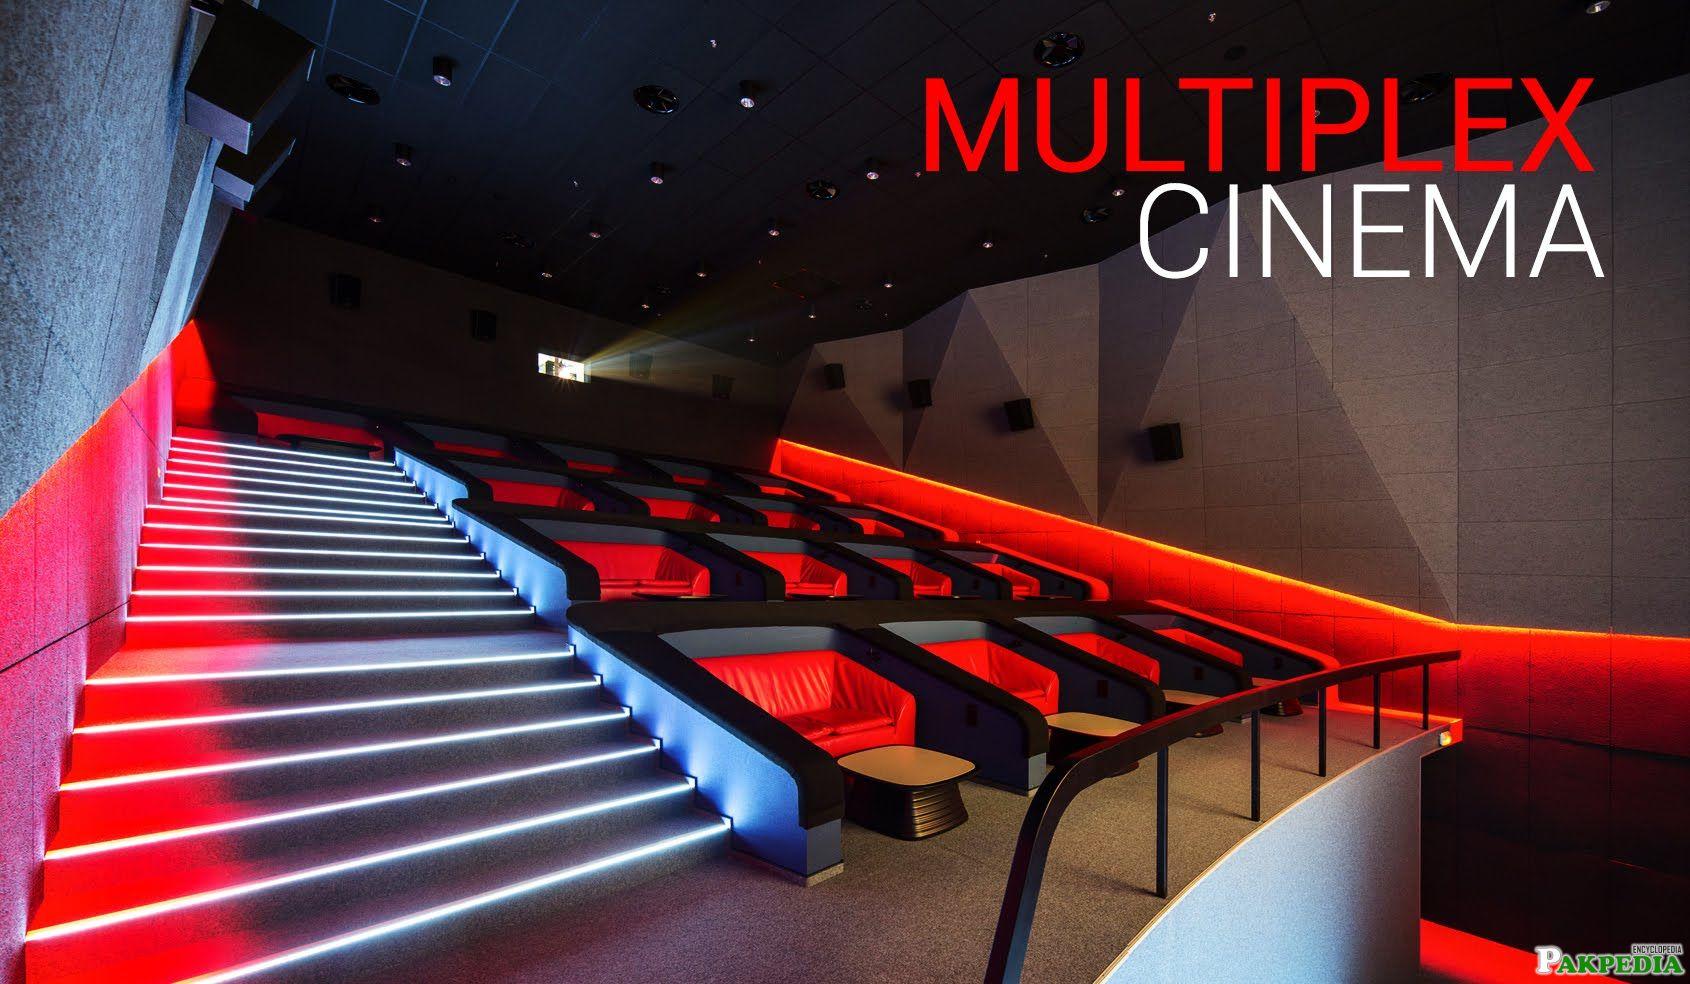 Multiplex Cinema Karachi